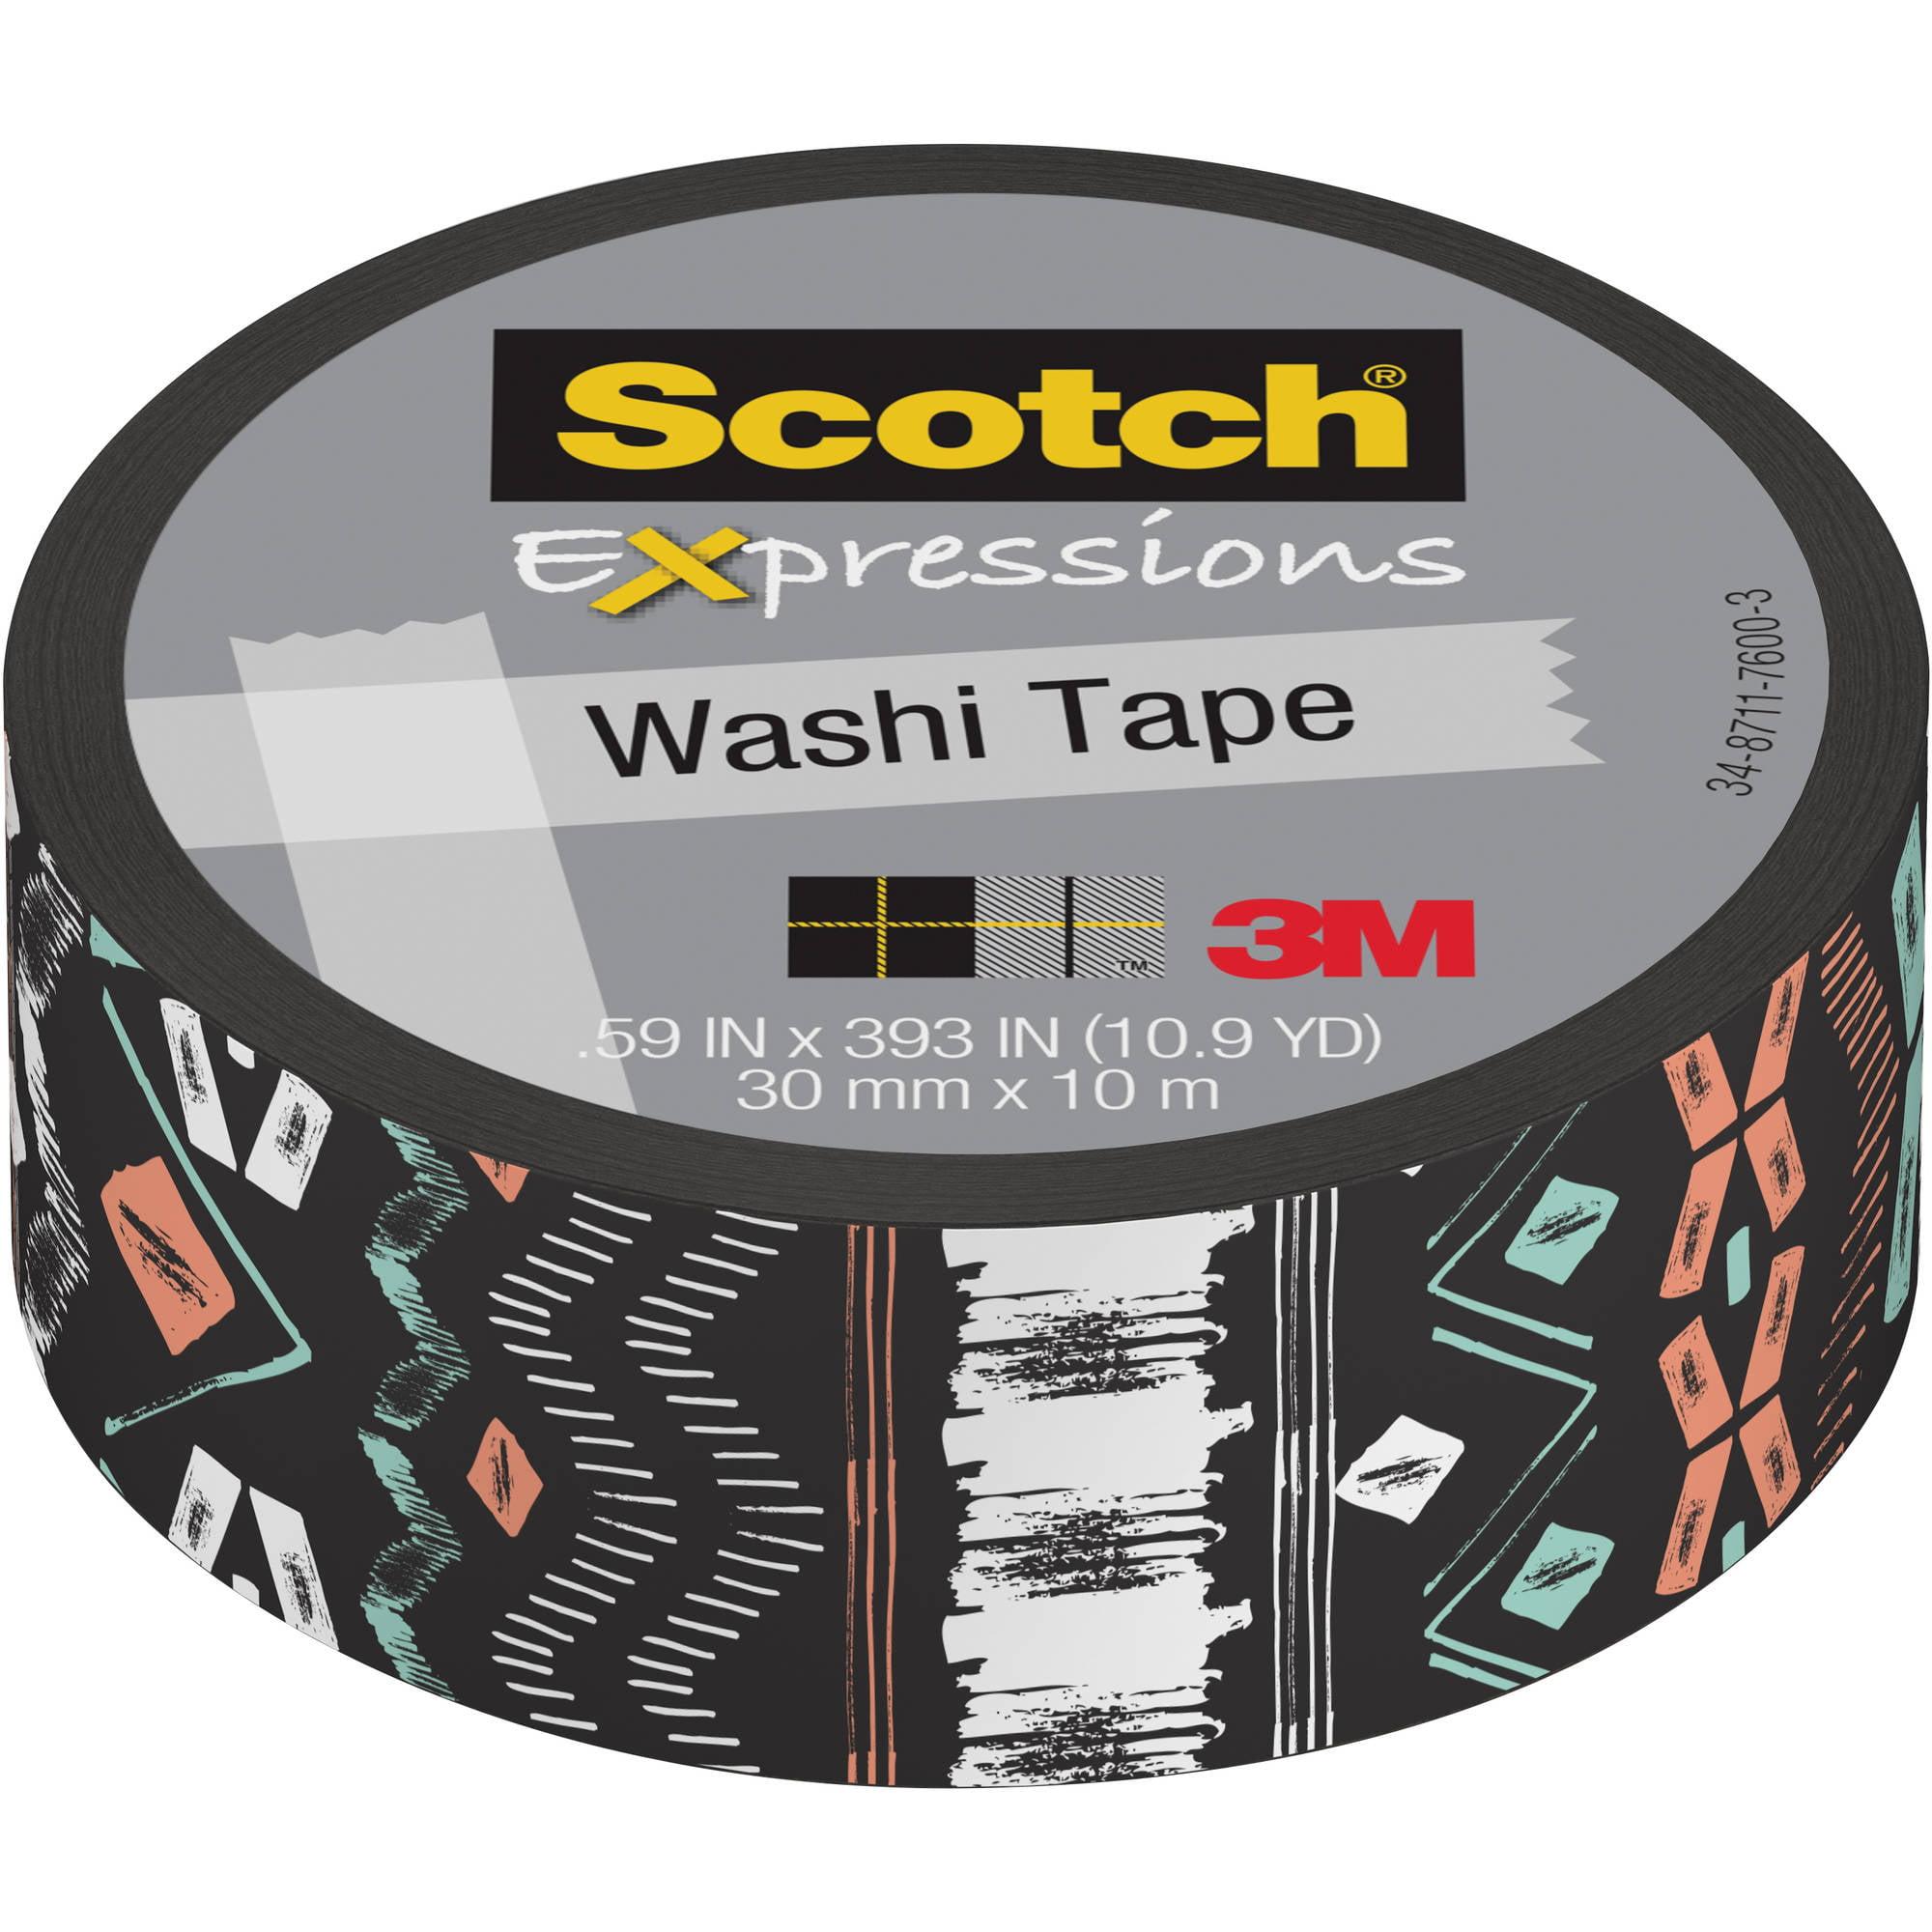 "Scotch Expressions Washi Tape, .59"" x 393"", Black Tribal"